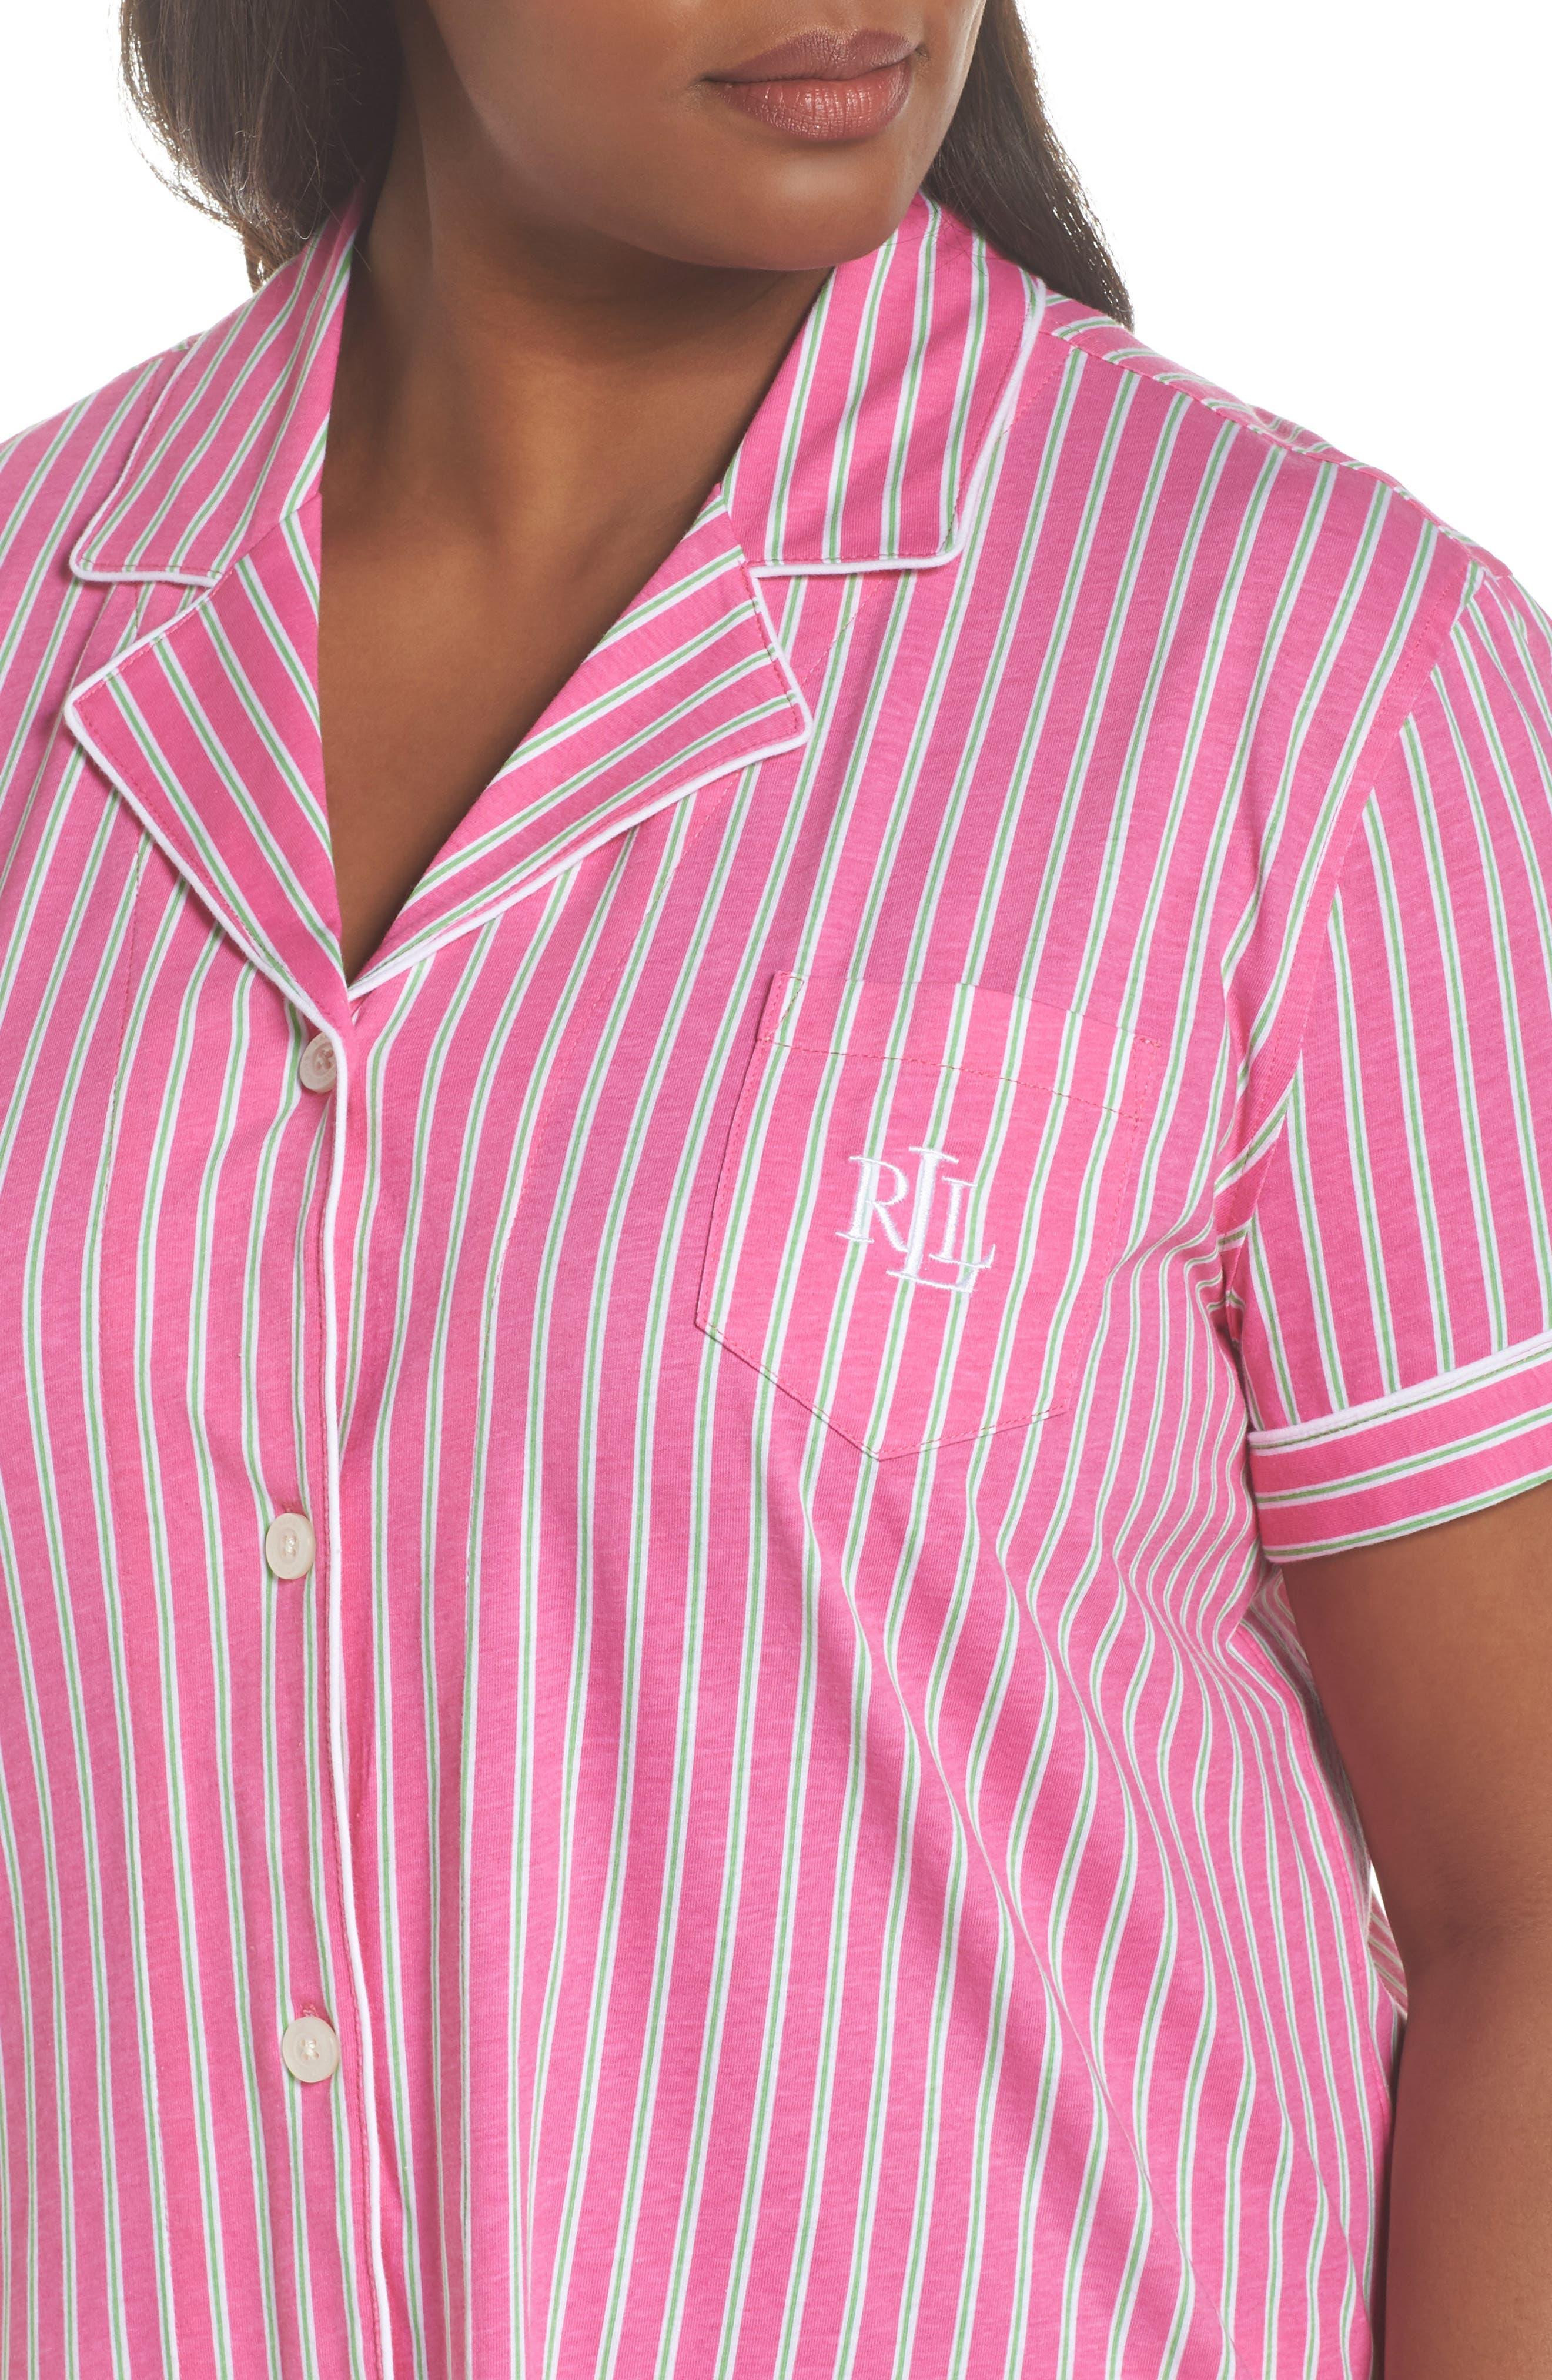 Bermuda Pajamas,                             Alternate thumbnail 4, color,